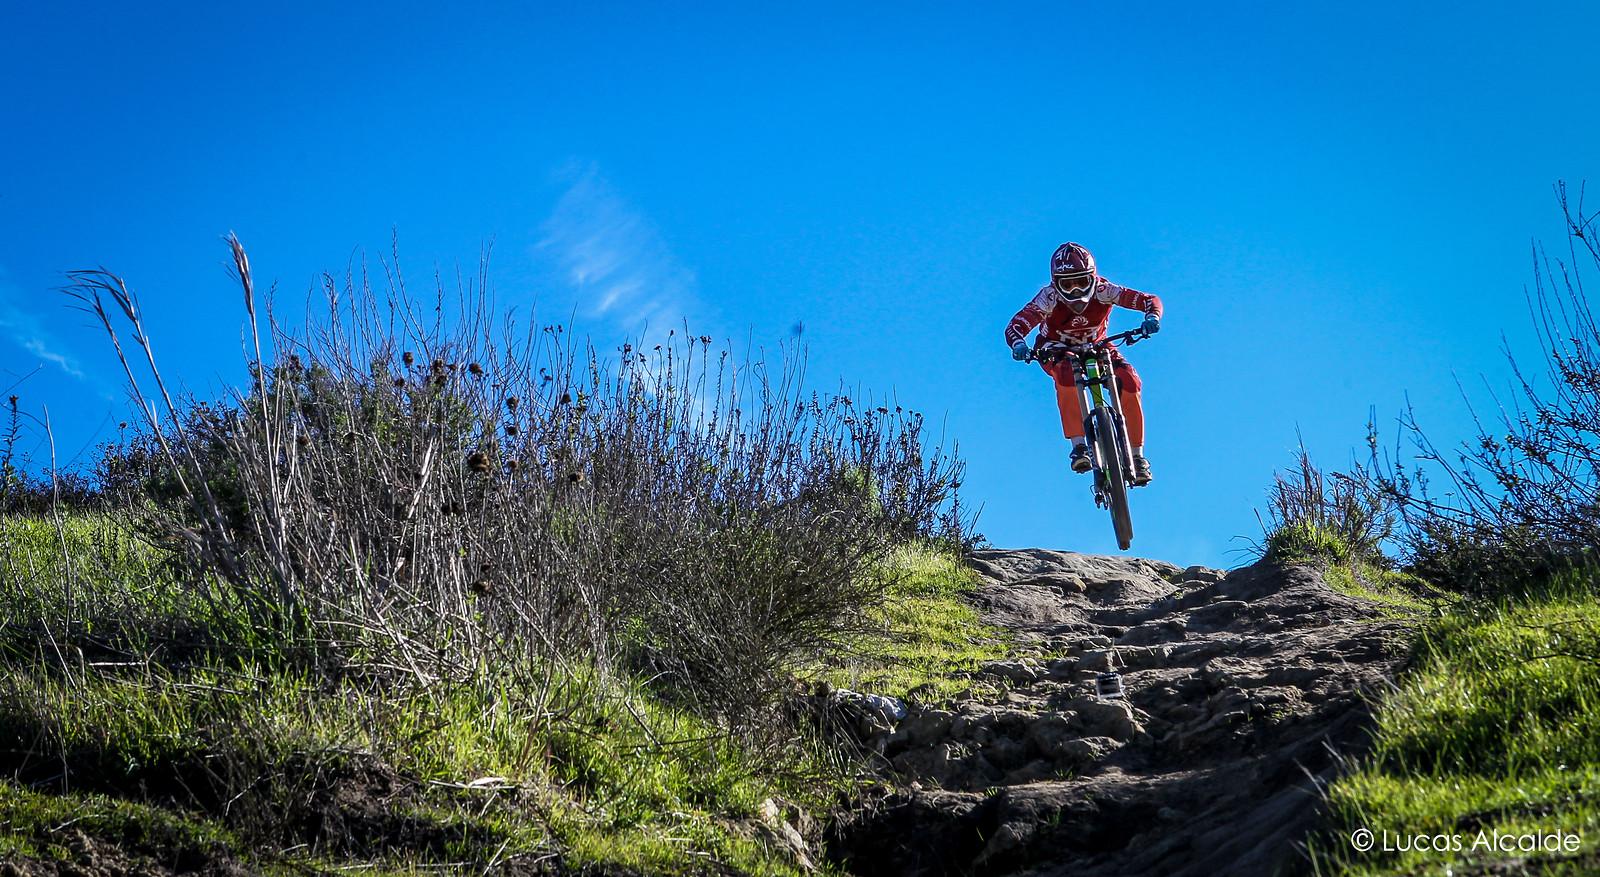 Luana Oliveira from Brazil in Laguna, CA. - Lucas_Alcalde - Mountain Biking Pictures - Vital MTB